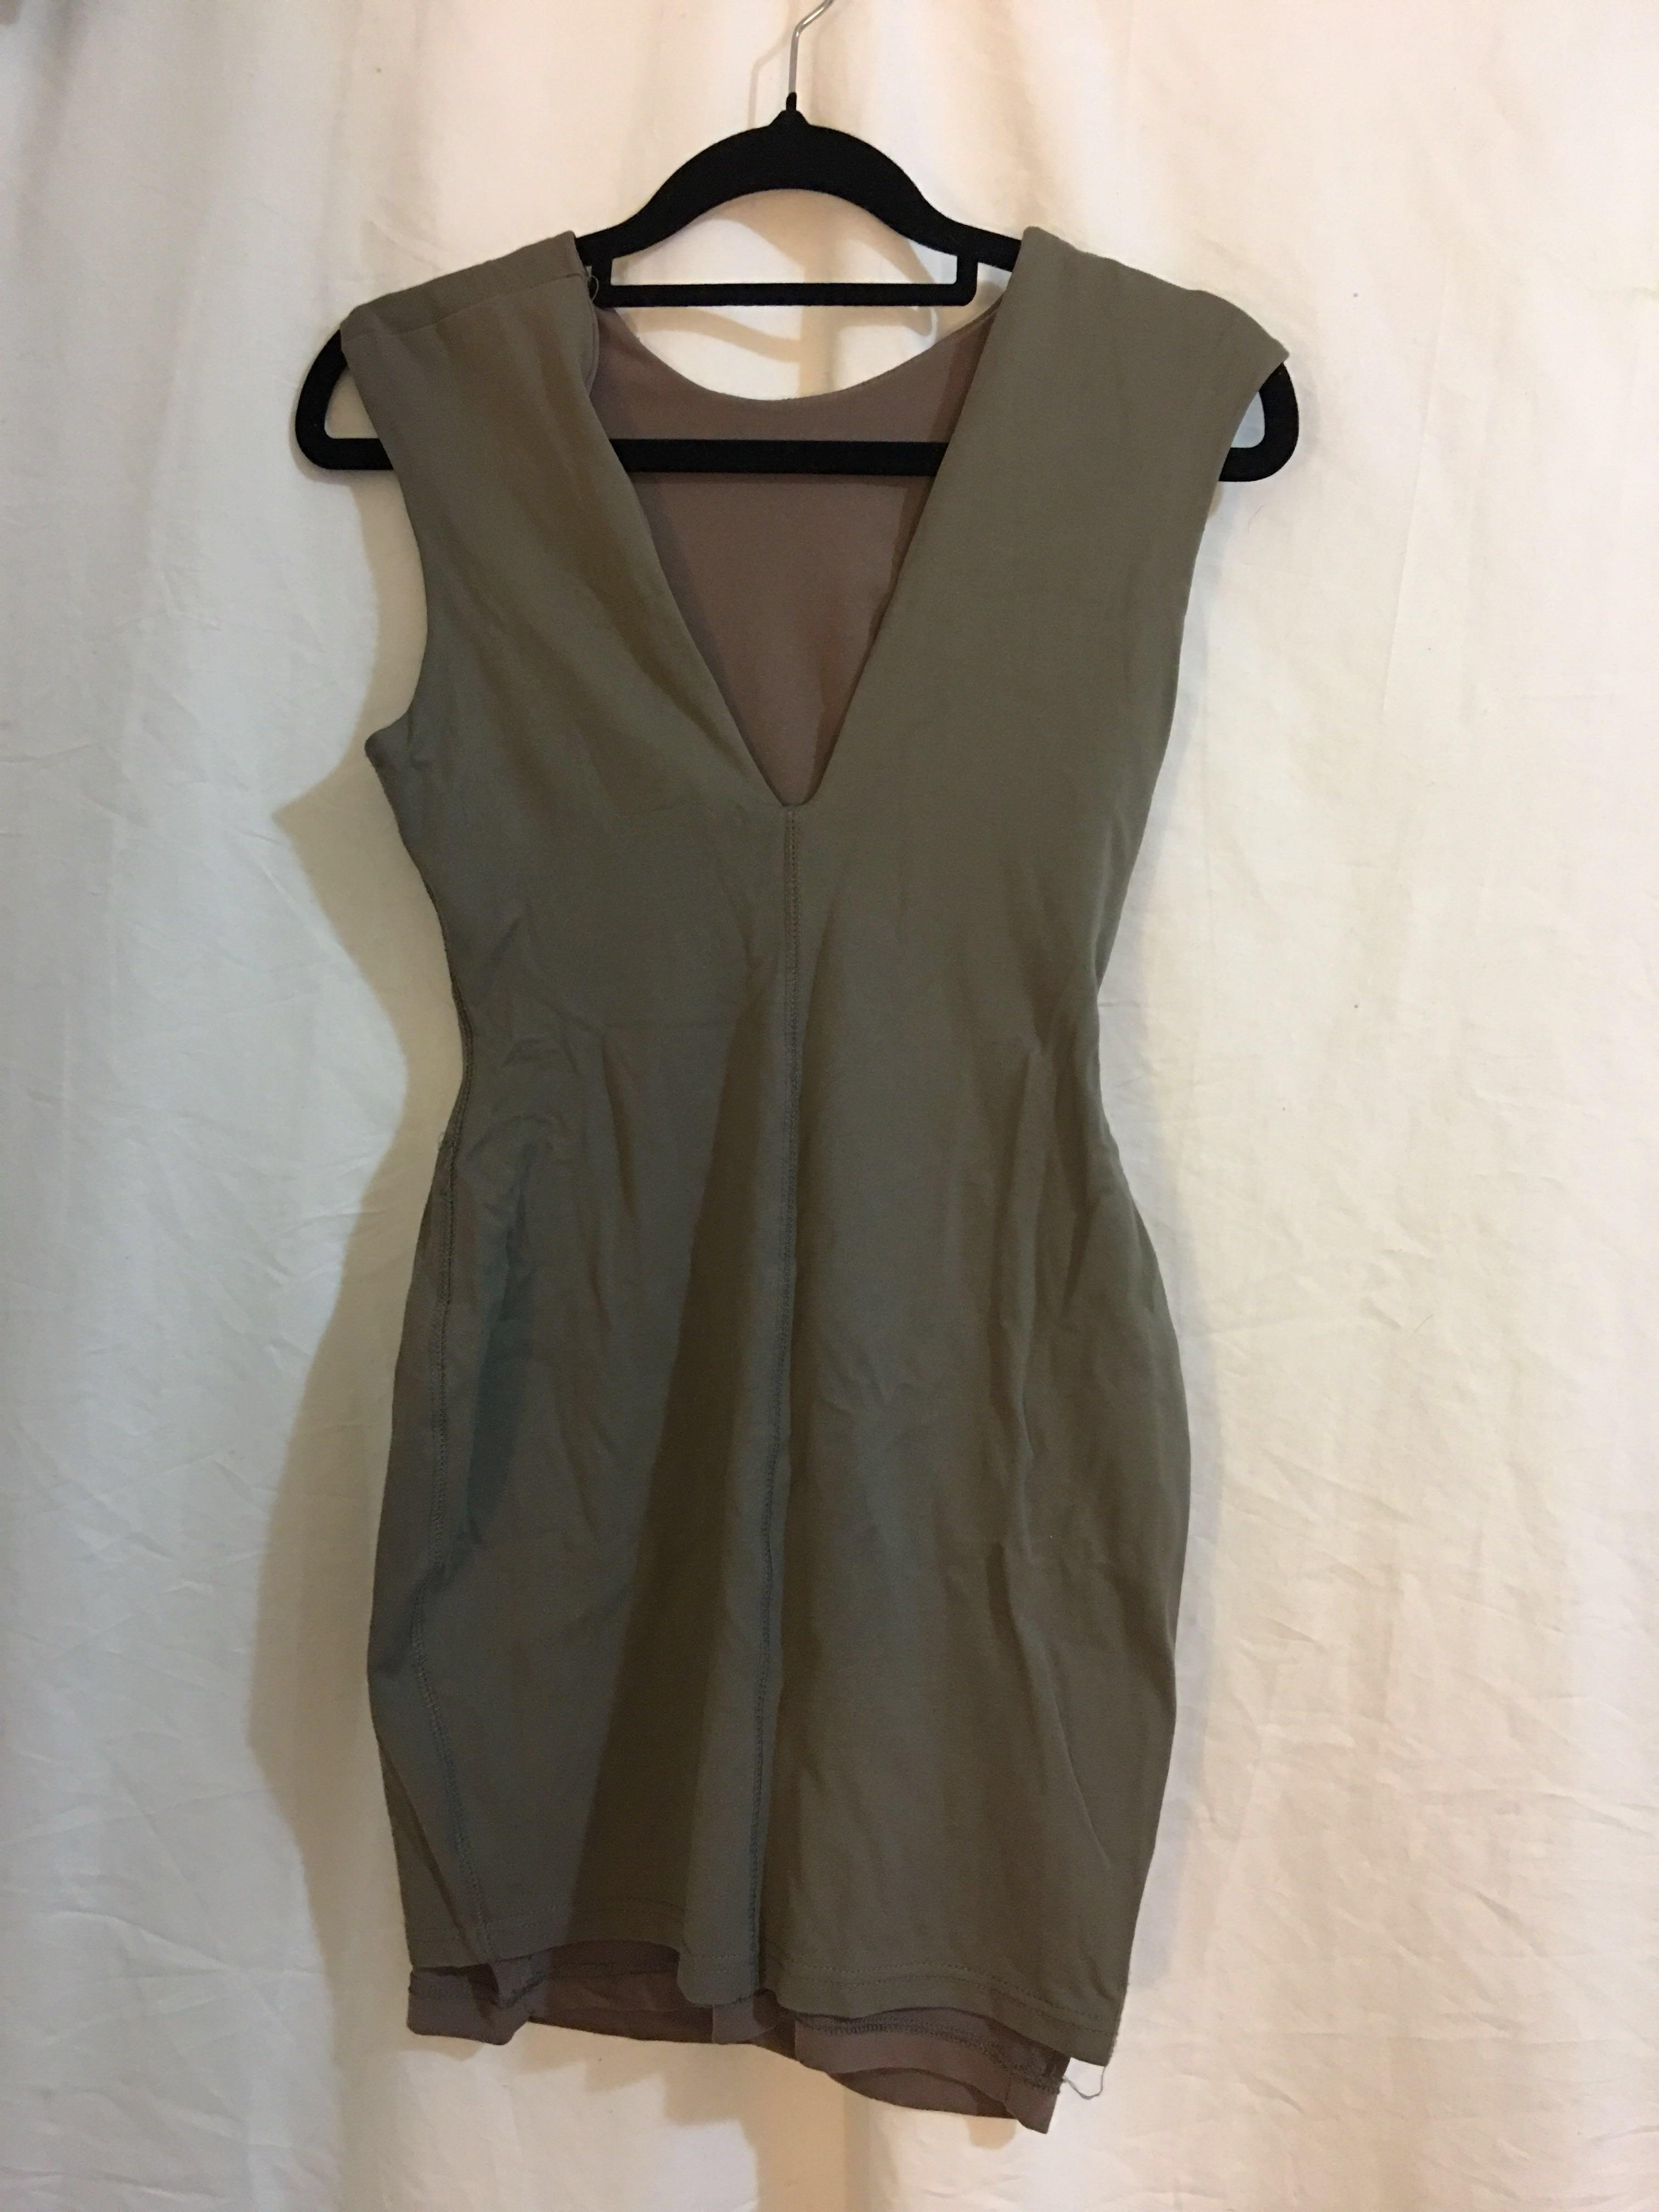 Bec and Bridge Khaki Dress size 8